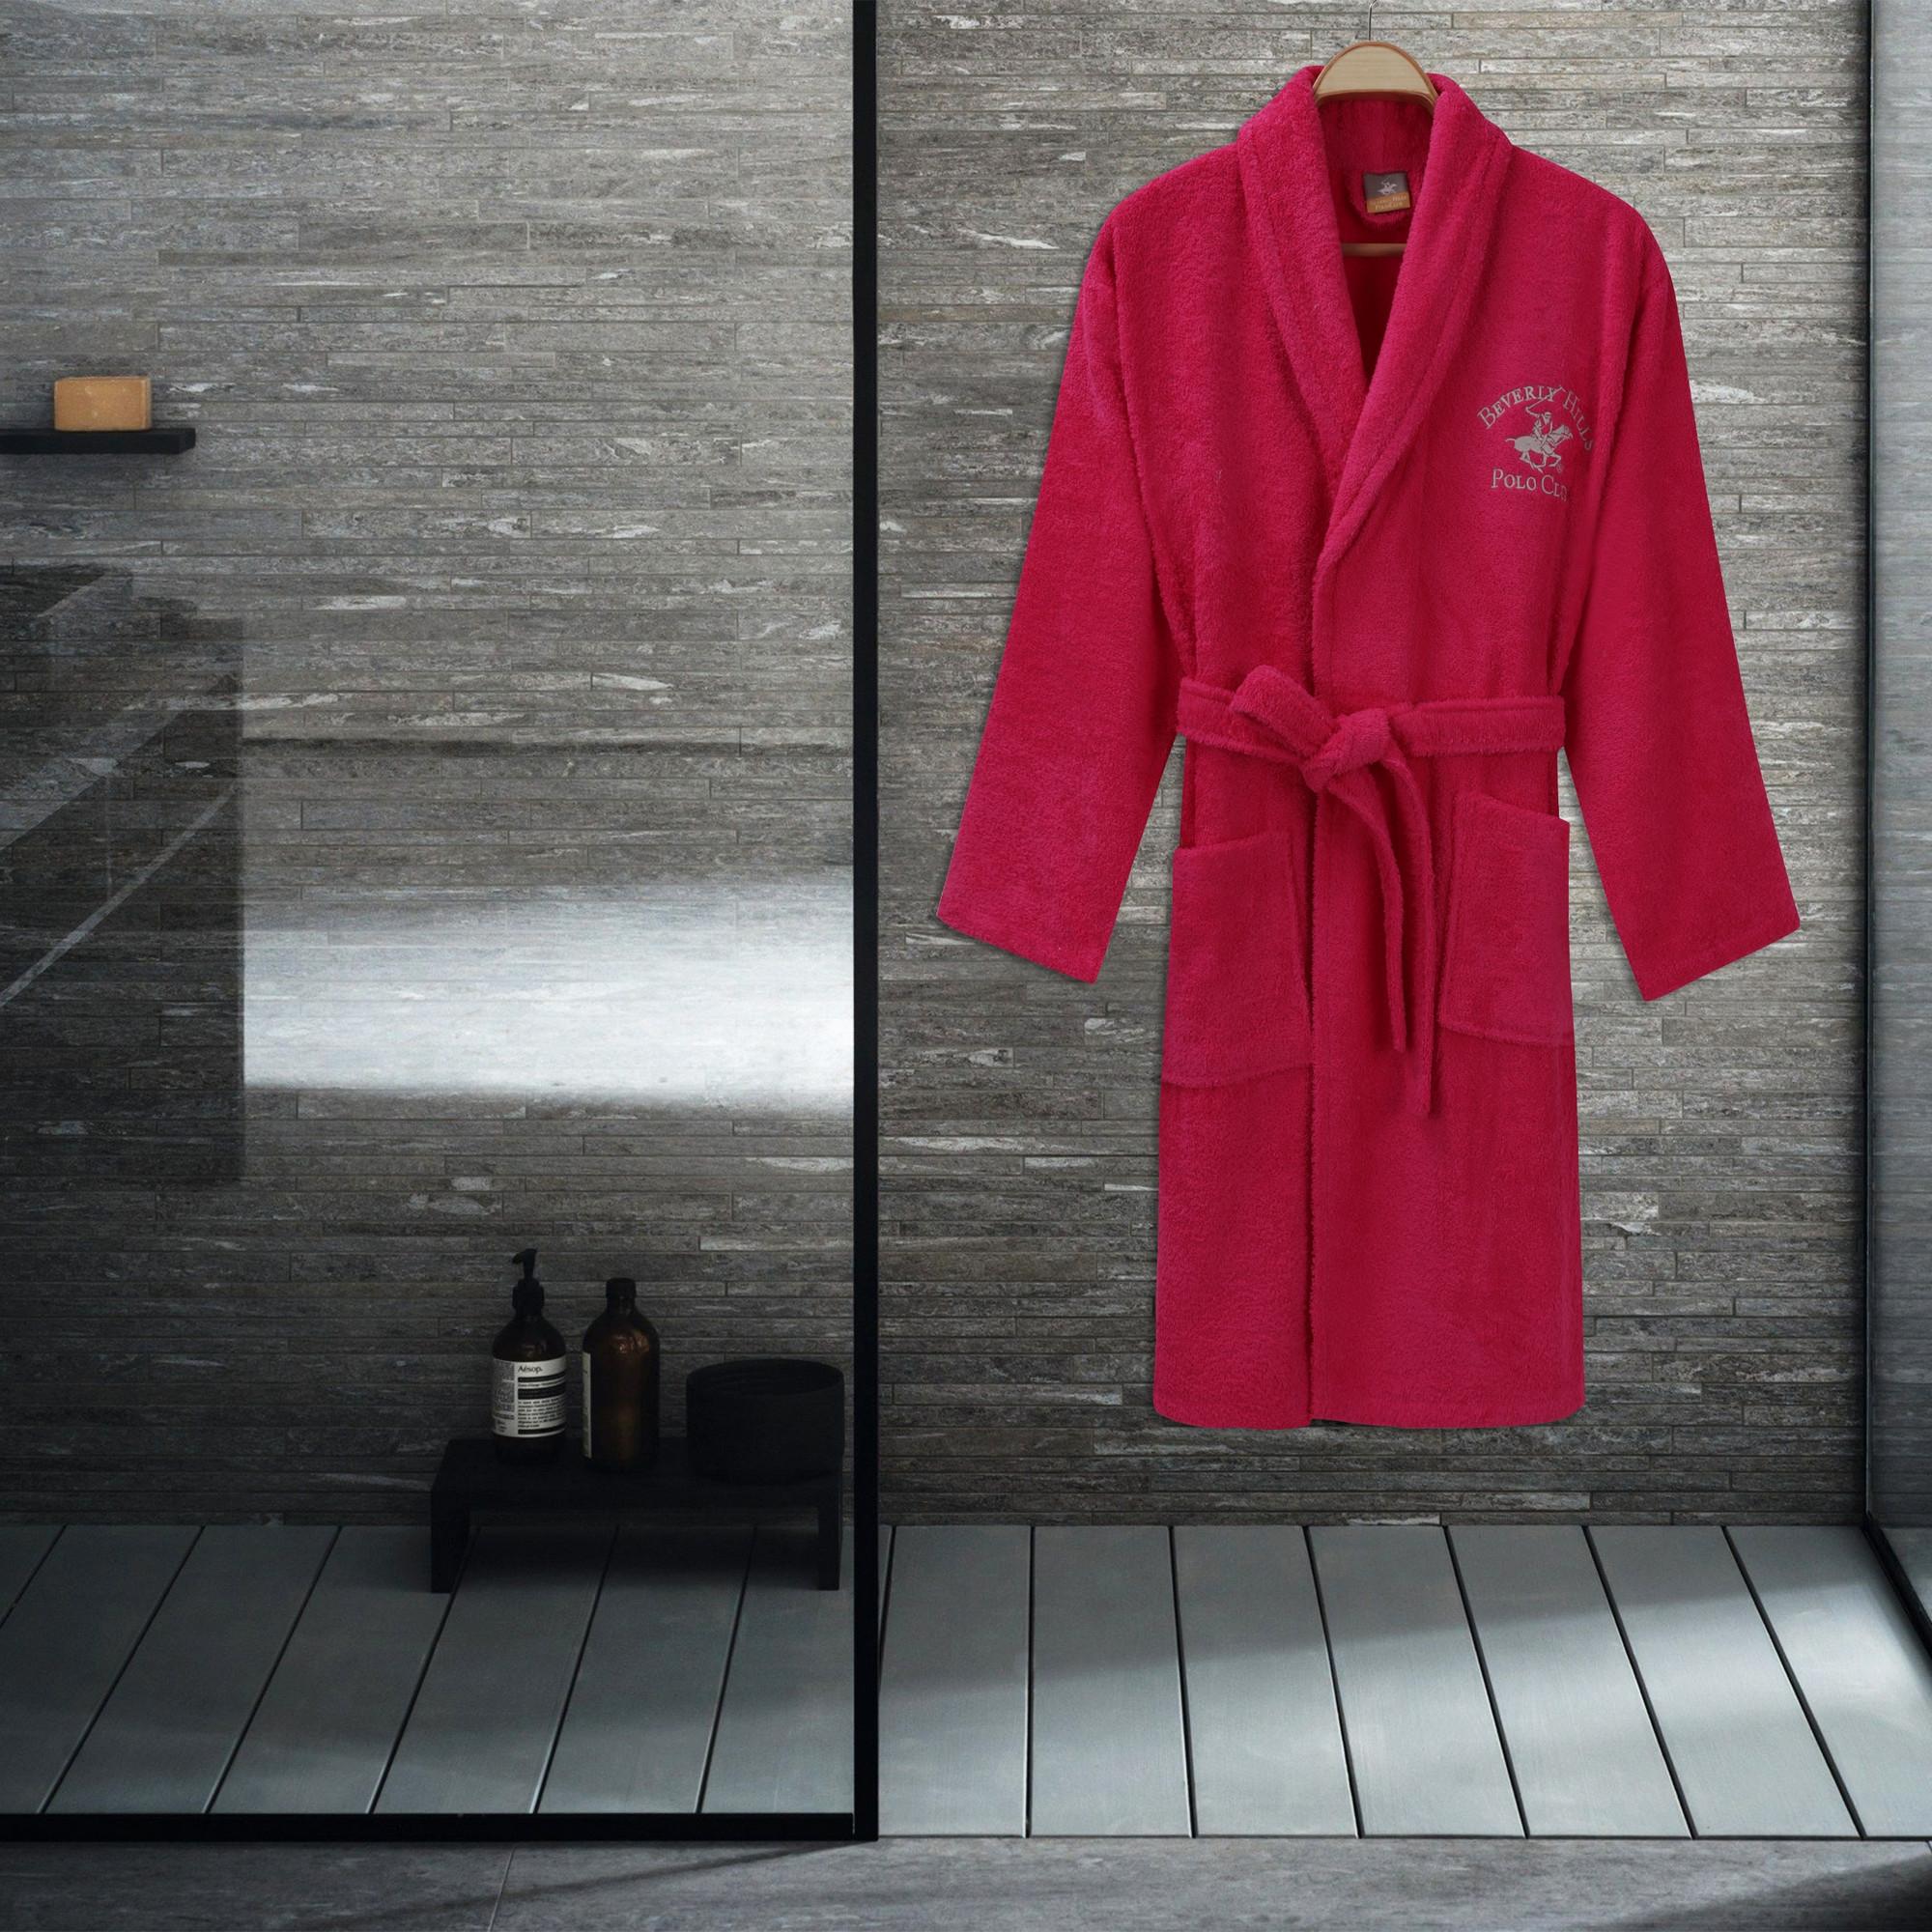 Halat de baie femei, din bumbac, Beverly Hills Polo Club 700 Roz, M / L